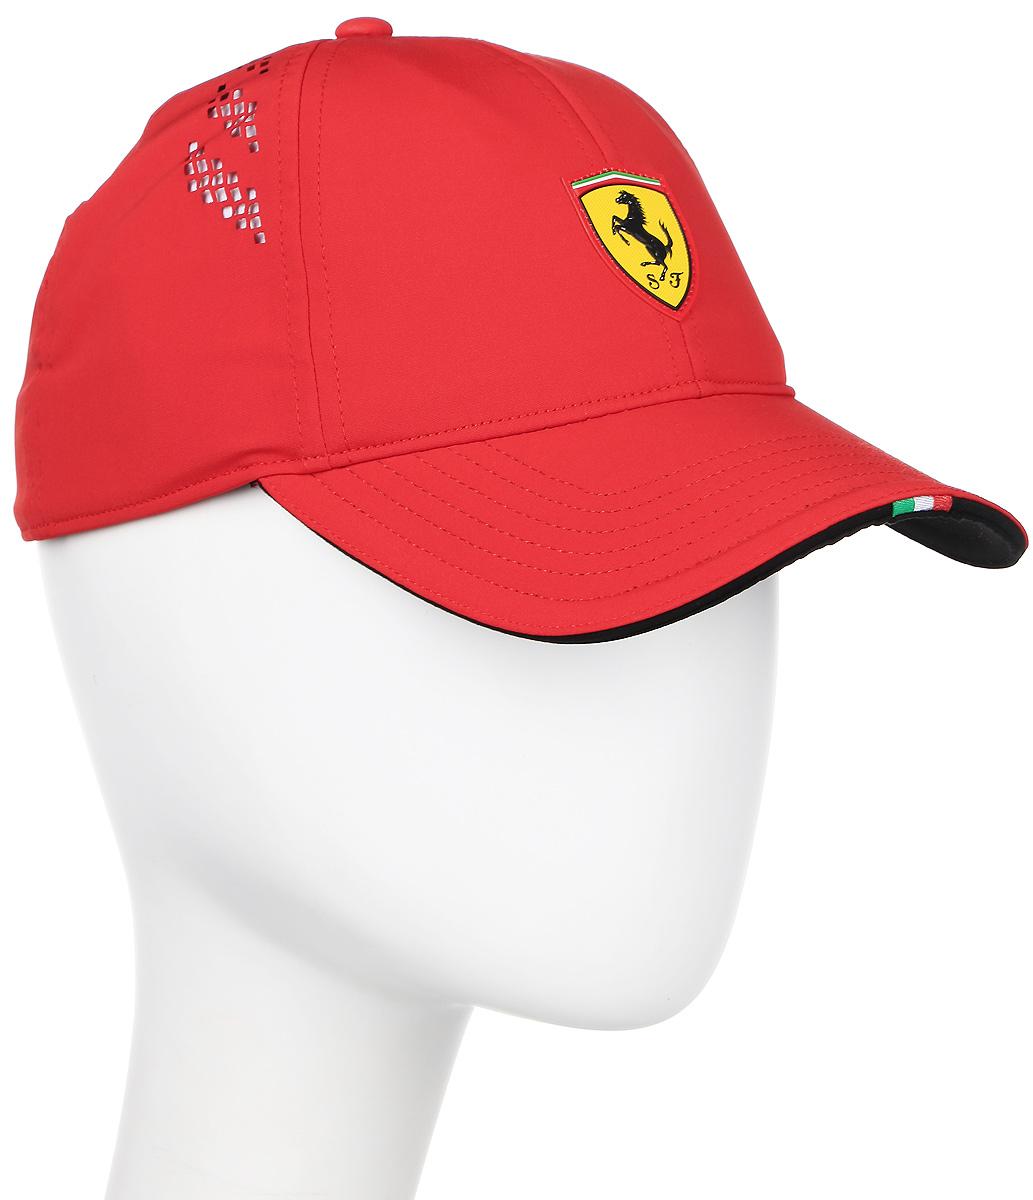 Бейсболка Puma Ferrari Fanwear force SF cap, цвет: красный. 021201_01. Размер L/XL (58)